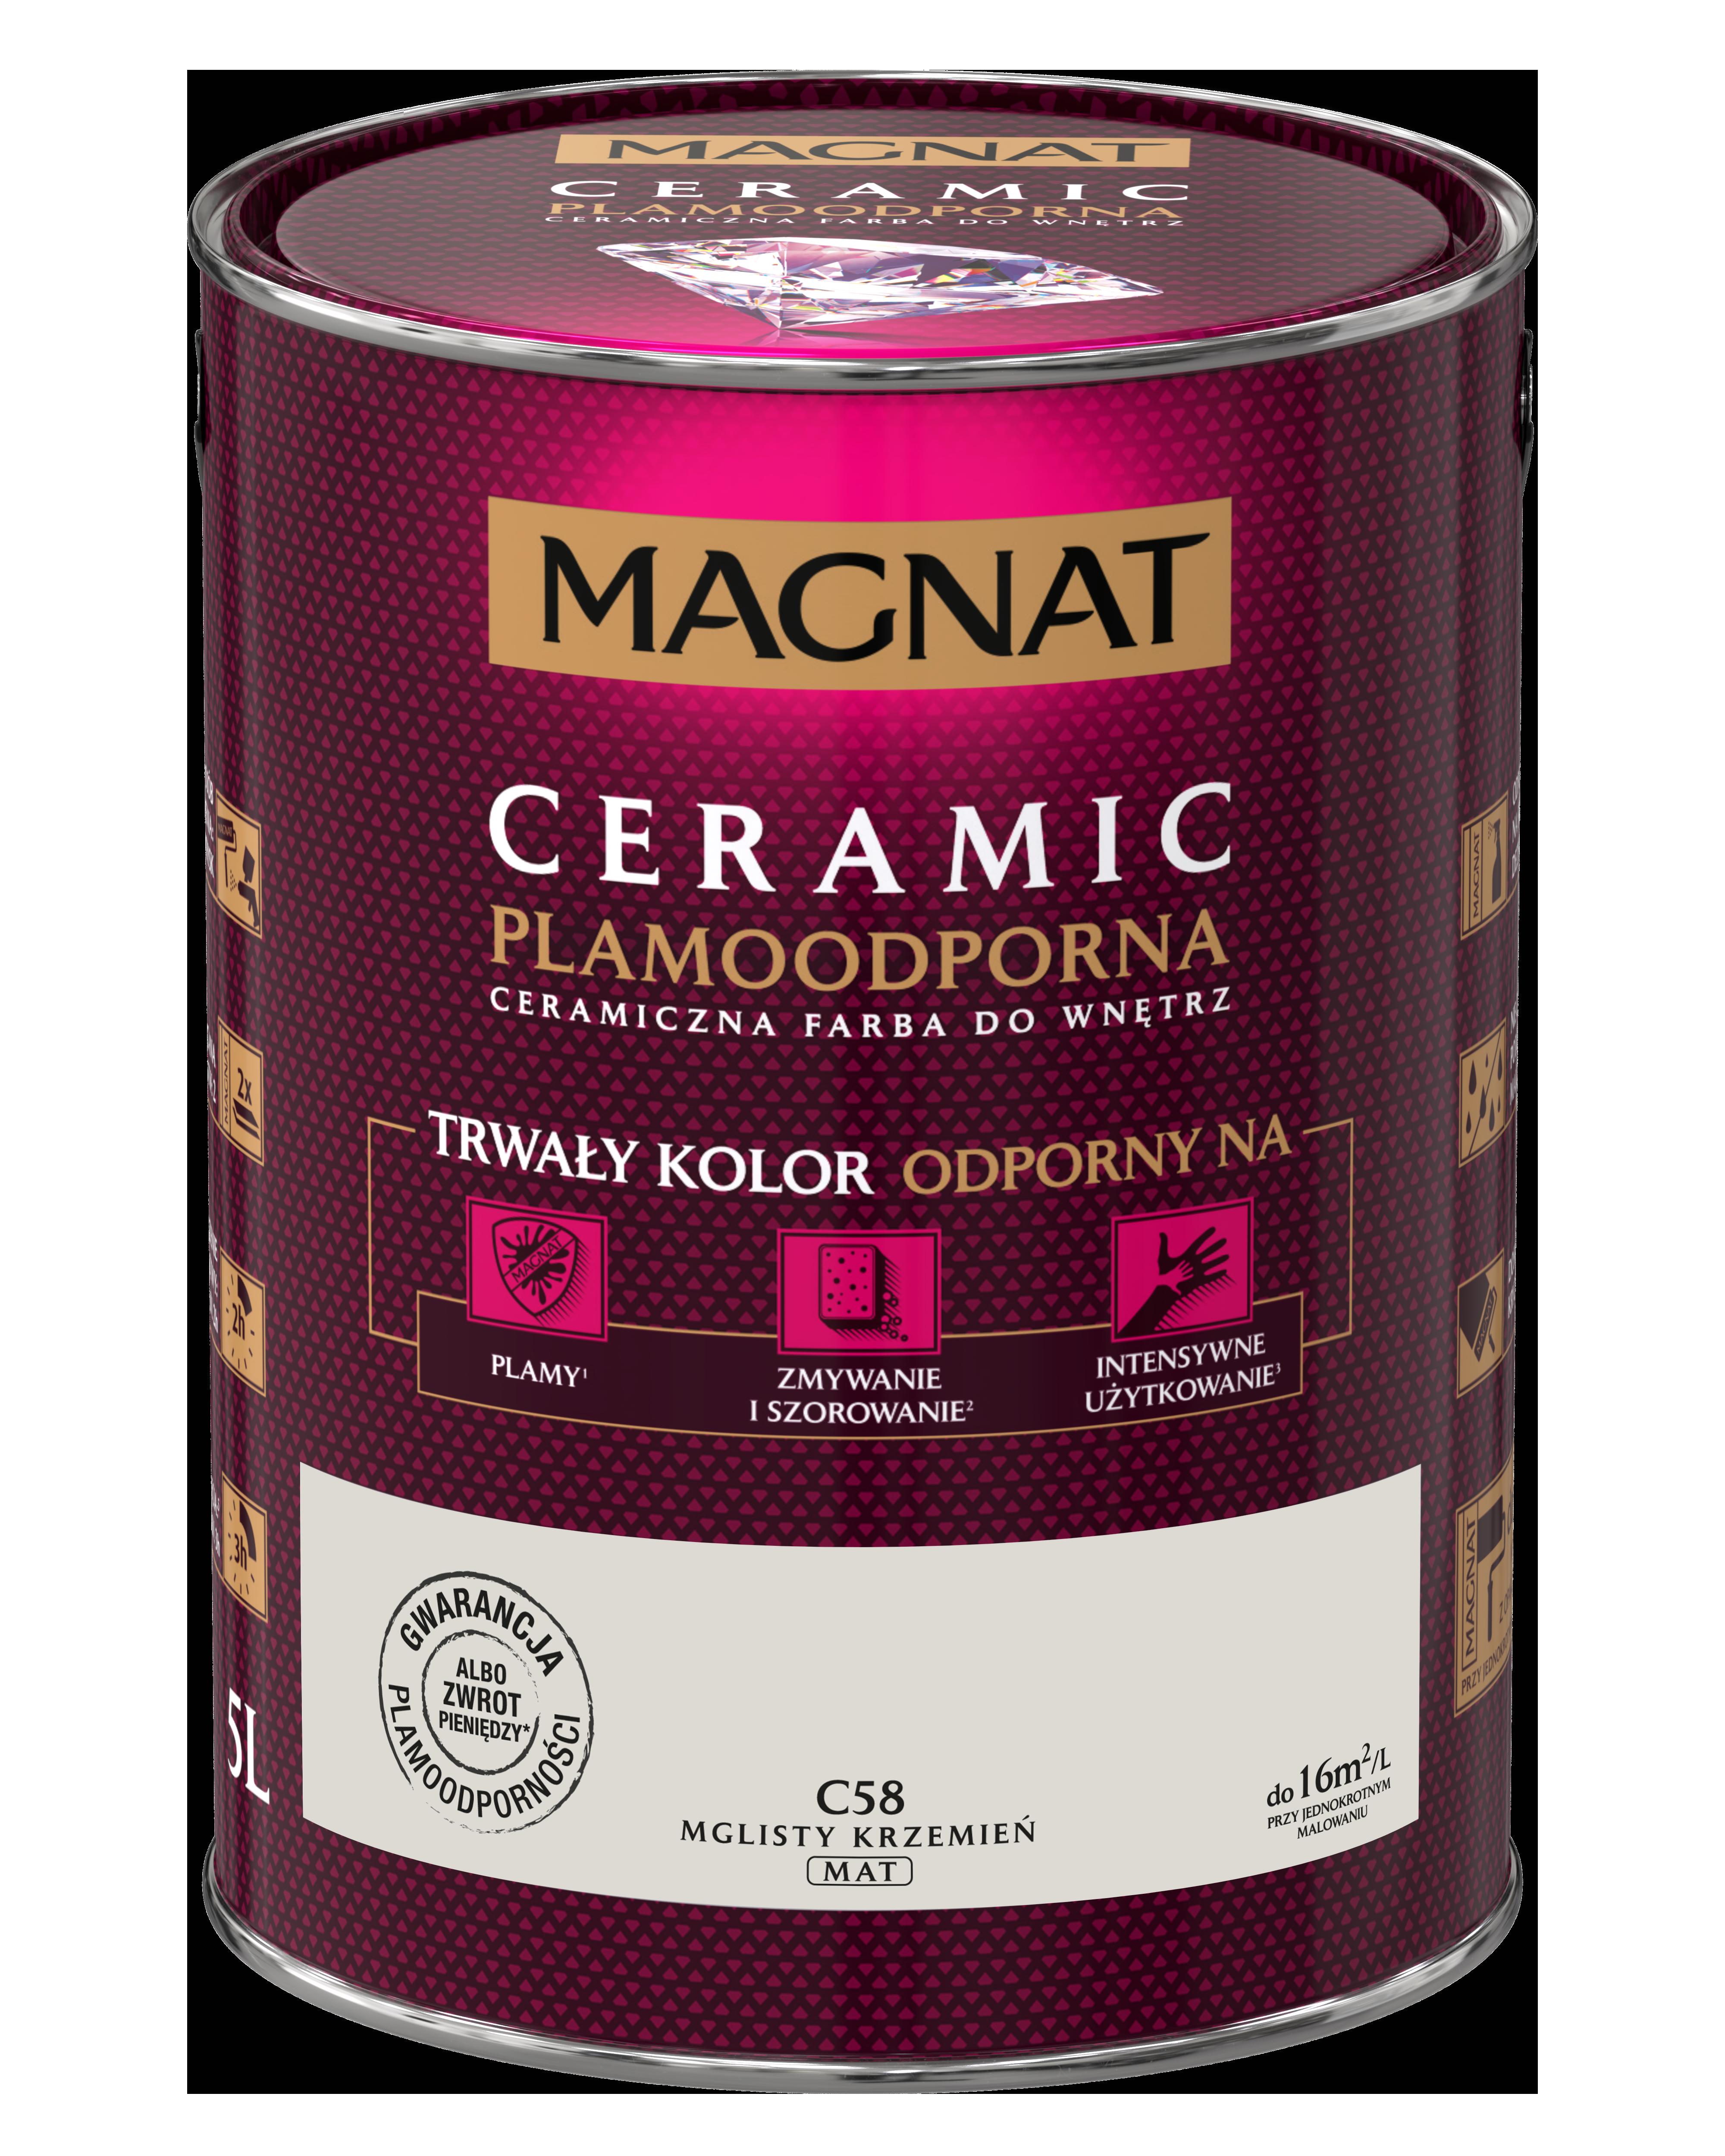 MAGNAT Ceramic C58 mlhavý pazourek 5L  §